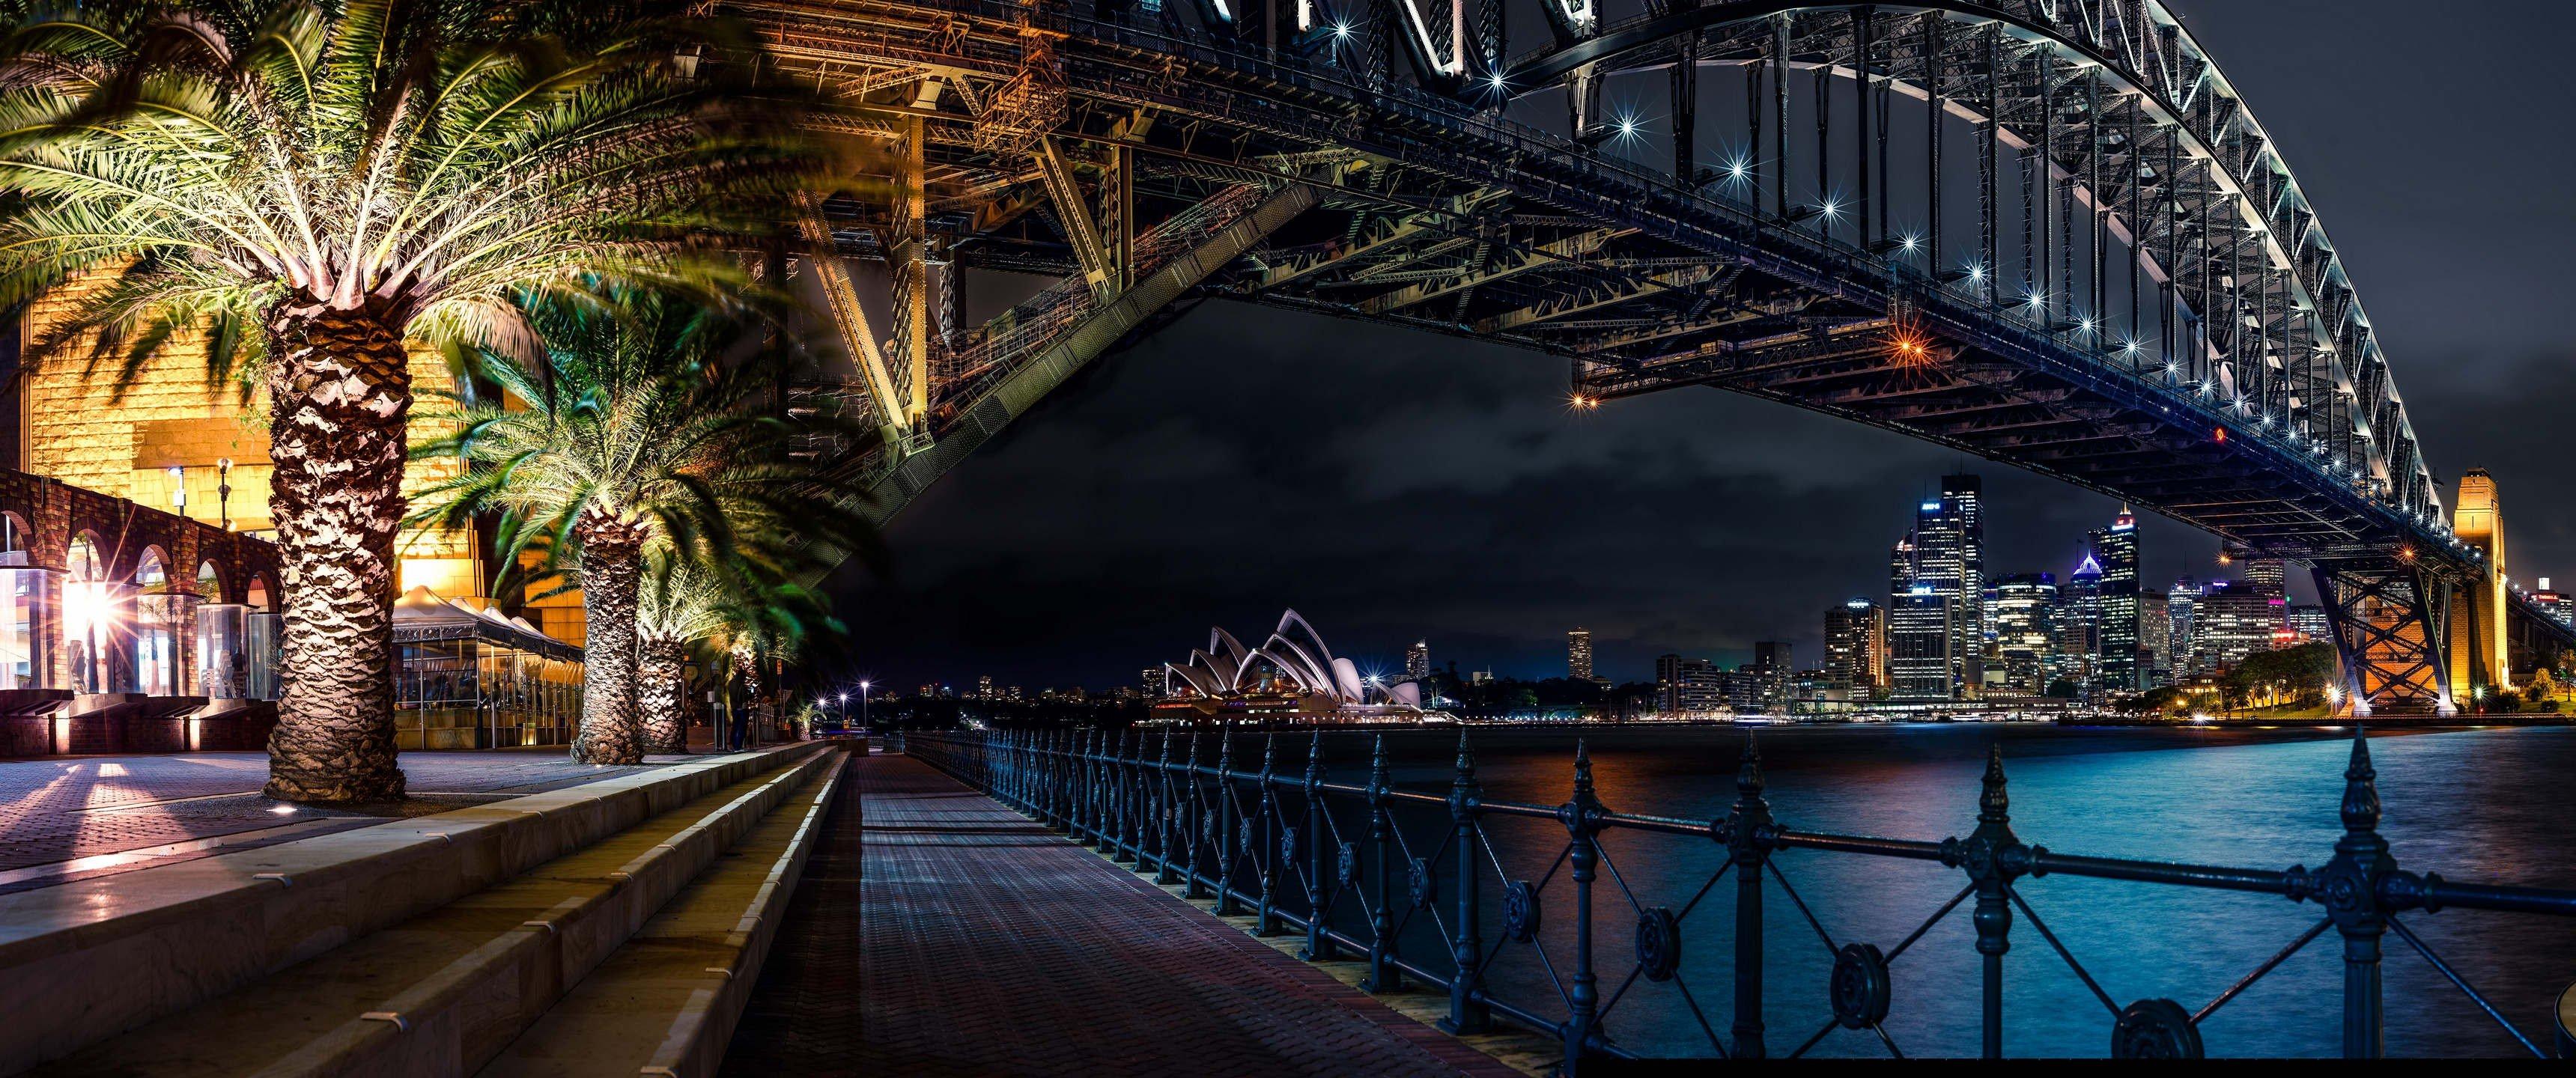 Wallpaper : 3440x1440 px, skyline, Sydney, ultrawide ...